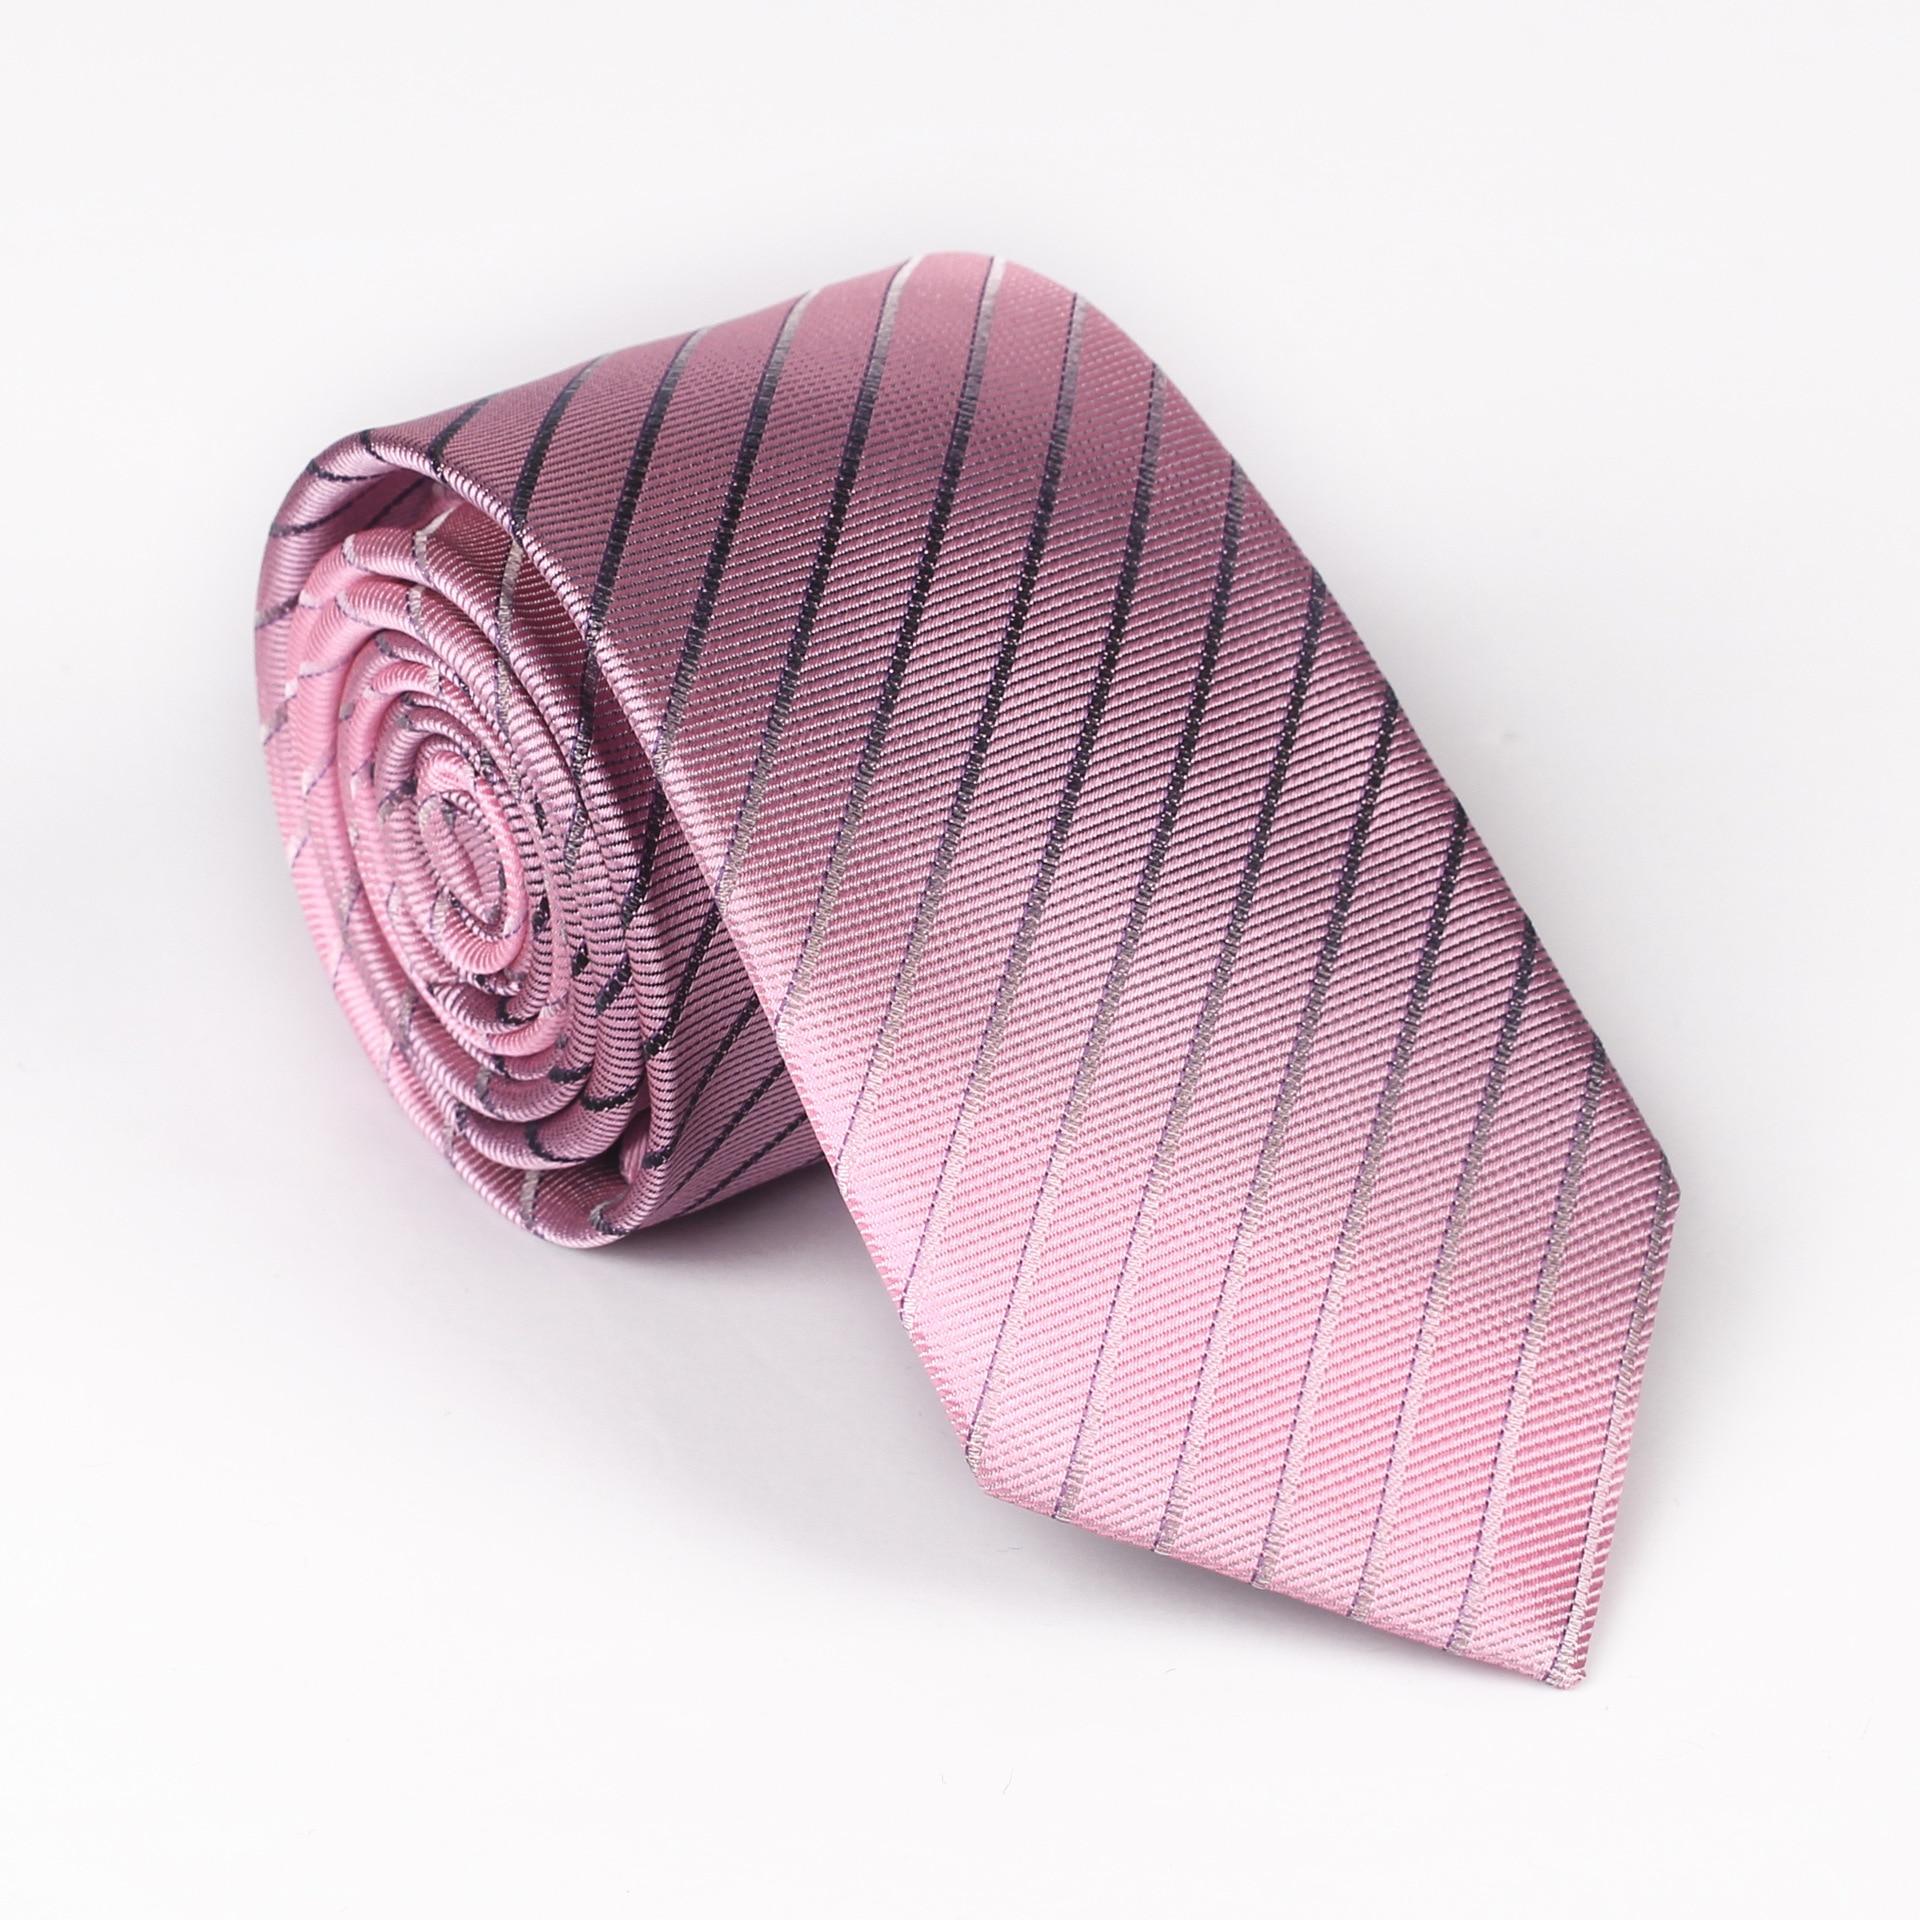 Spot A Generation Of Tie Men's 6cm Diagonal Stripes Tie Dress Polyester Silk Jacquard Business Narrow Tie Male